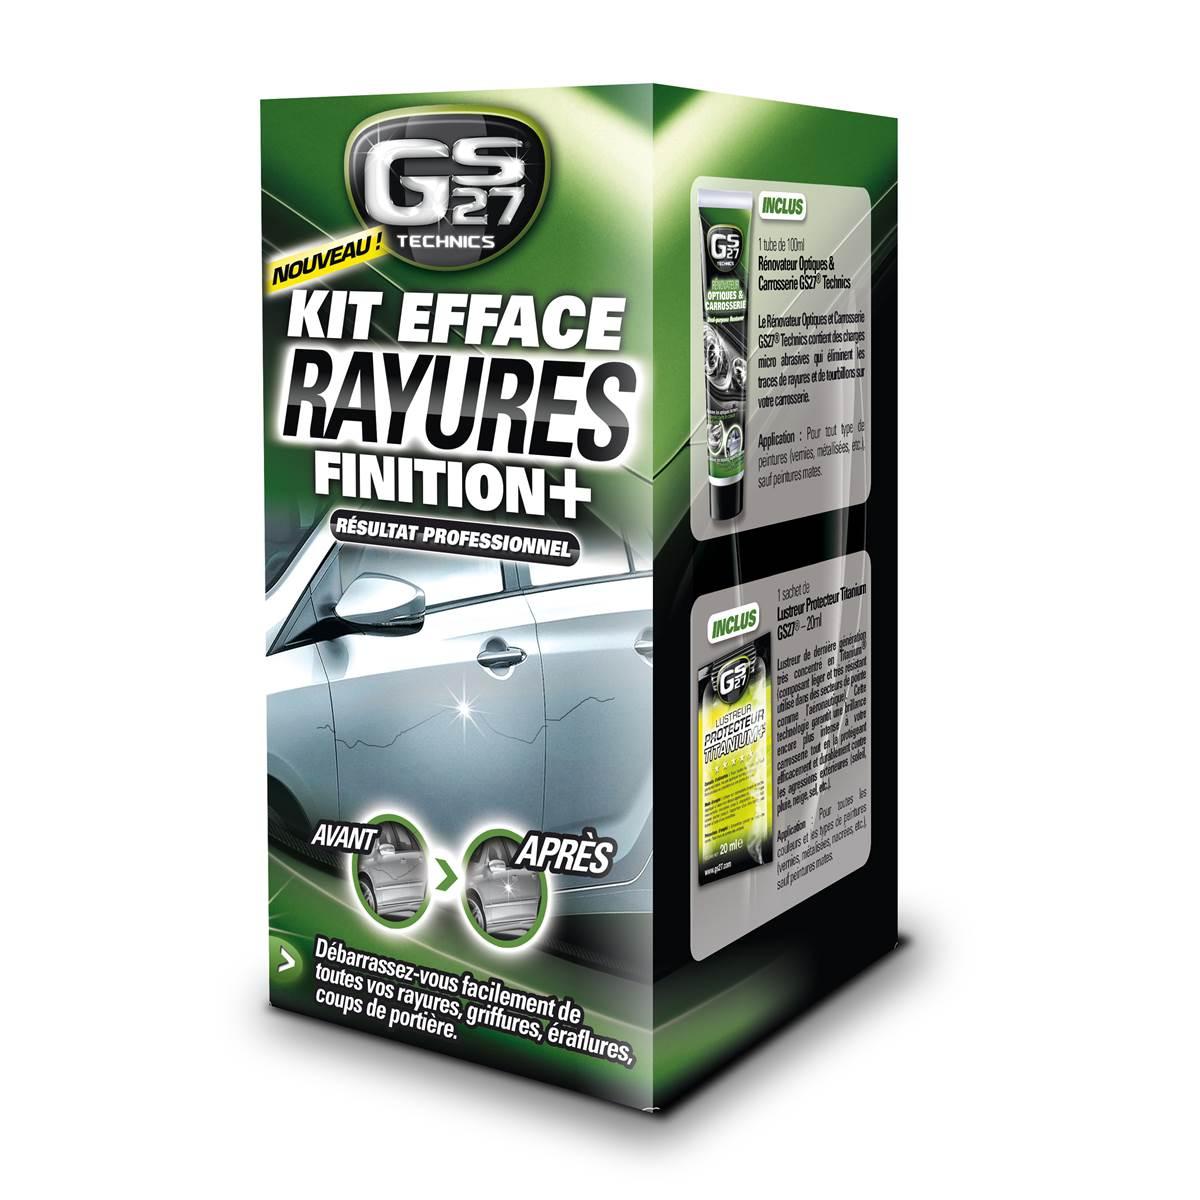 Kit efface rayures Finition Plus GS27